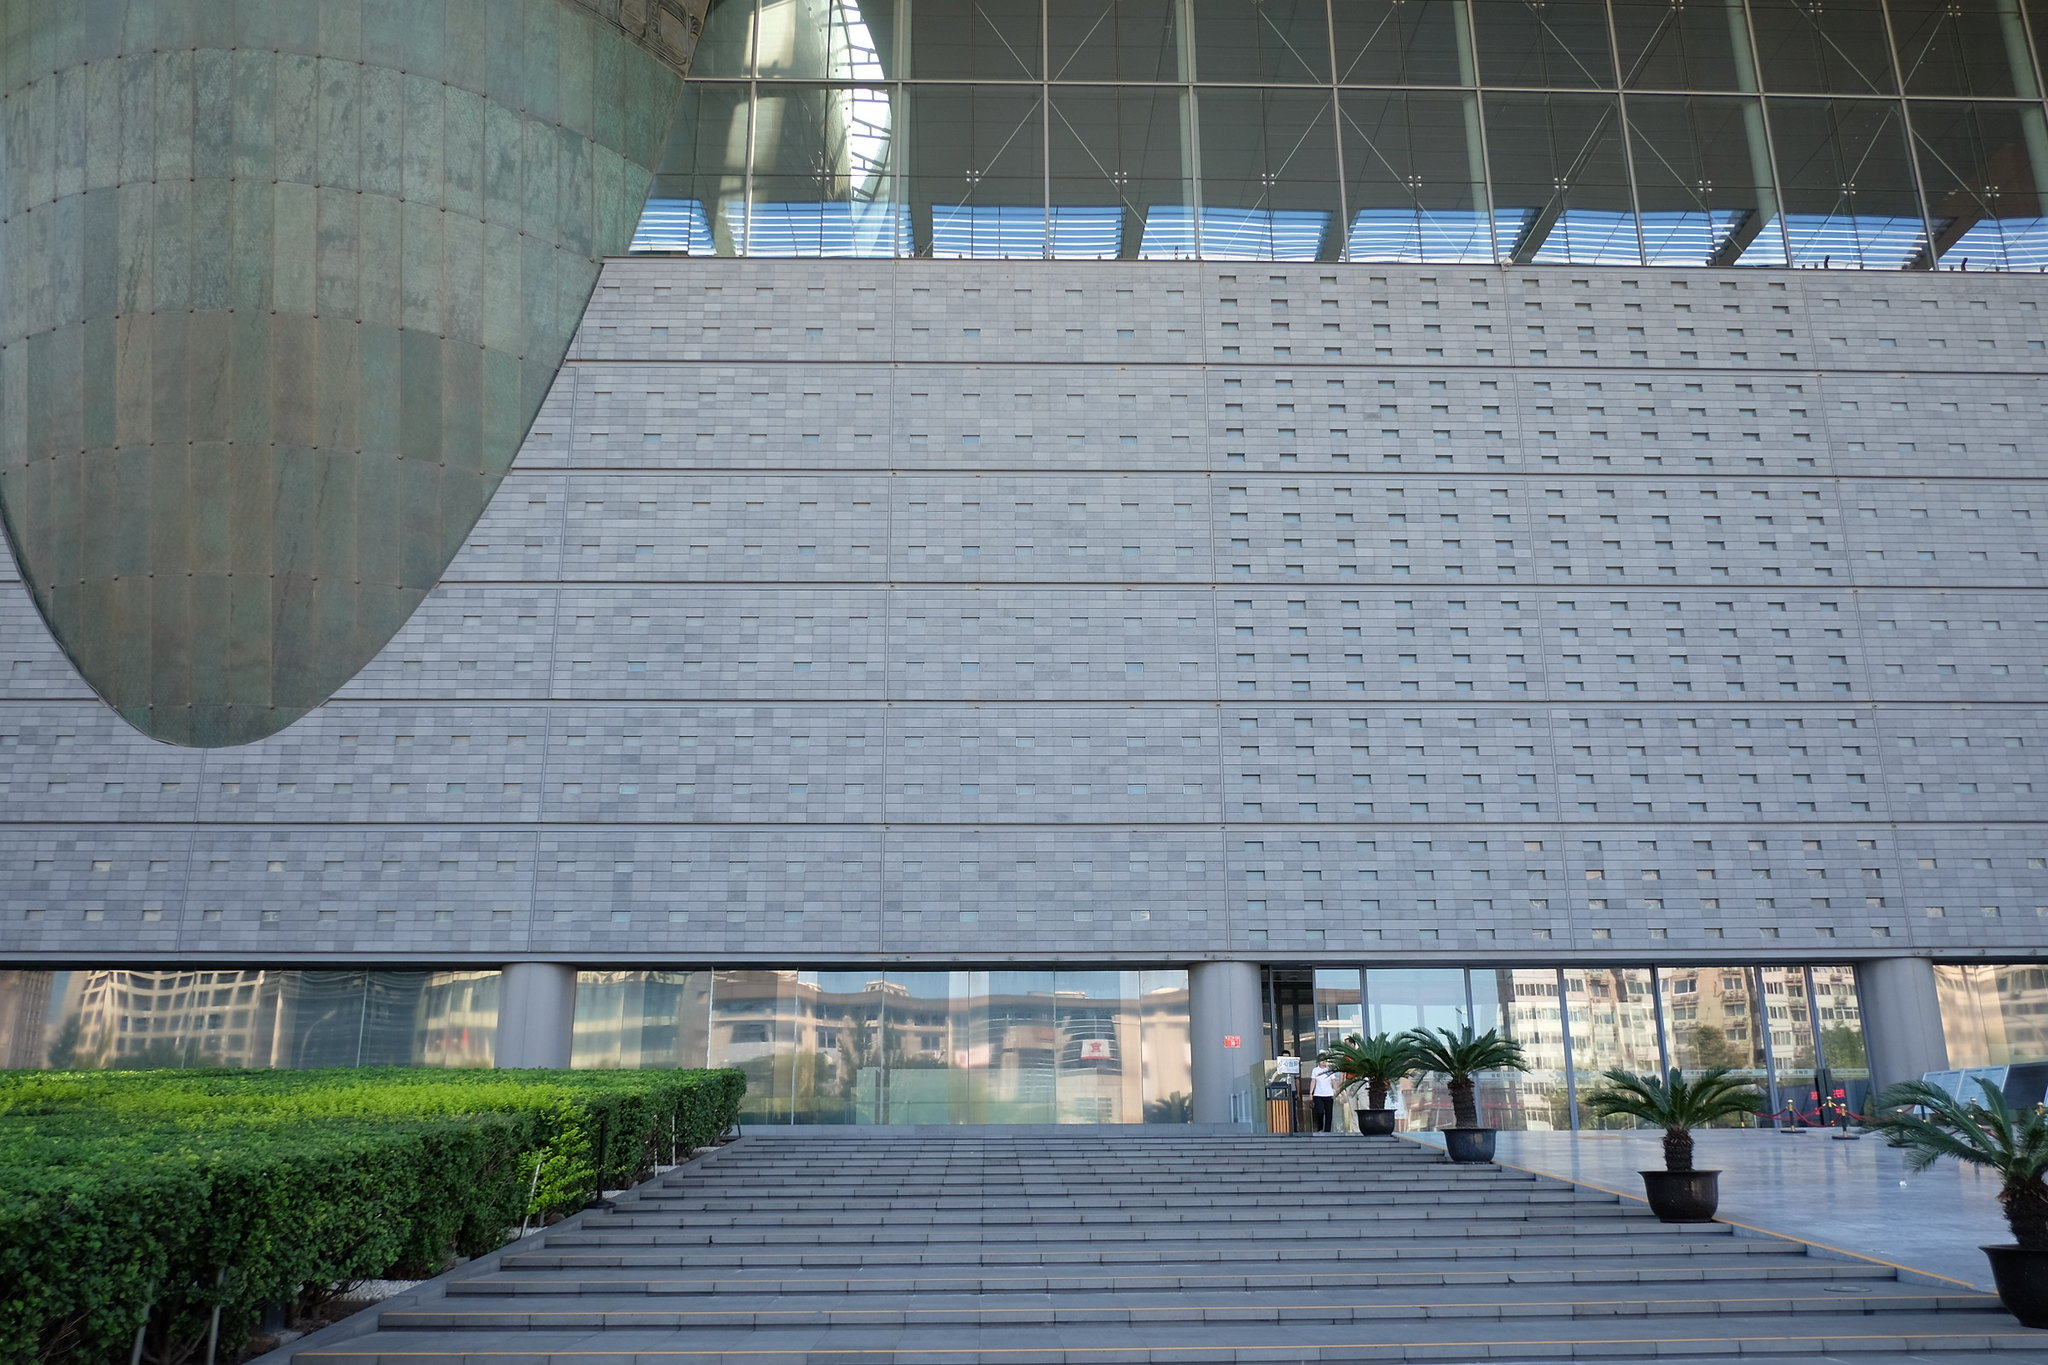 Capital Museum BJ